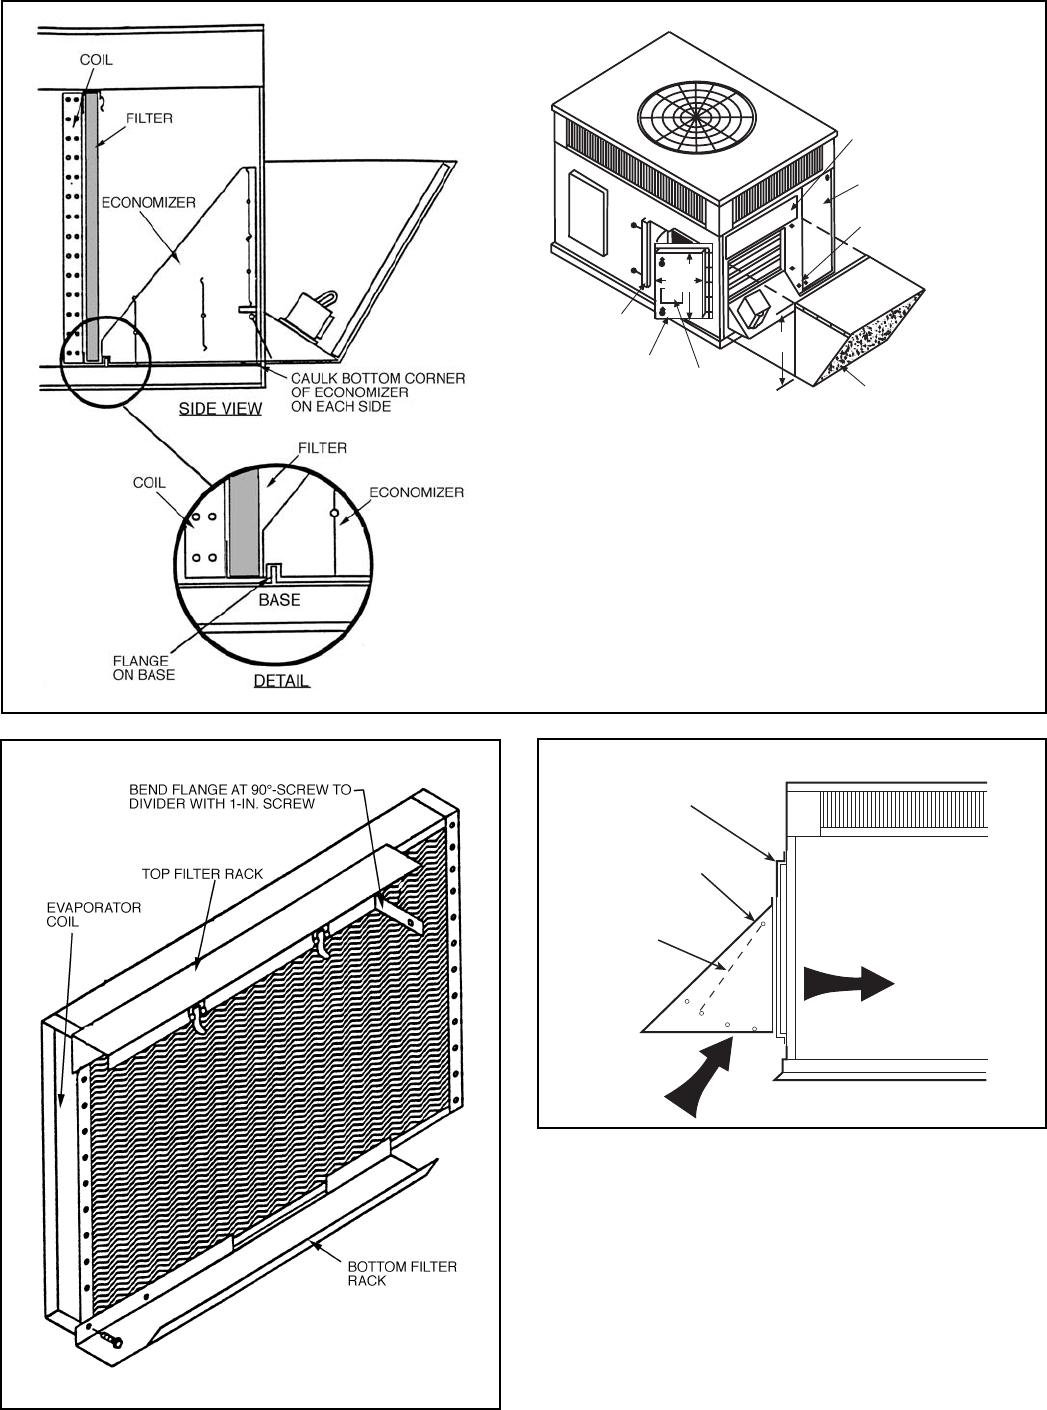 Bryant 574b Filter Rack Manual Outside Air Damper Economizer Wiring Diagram